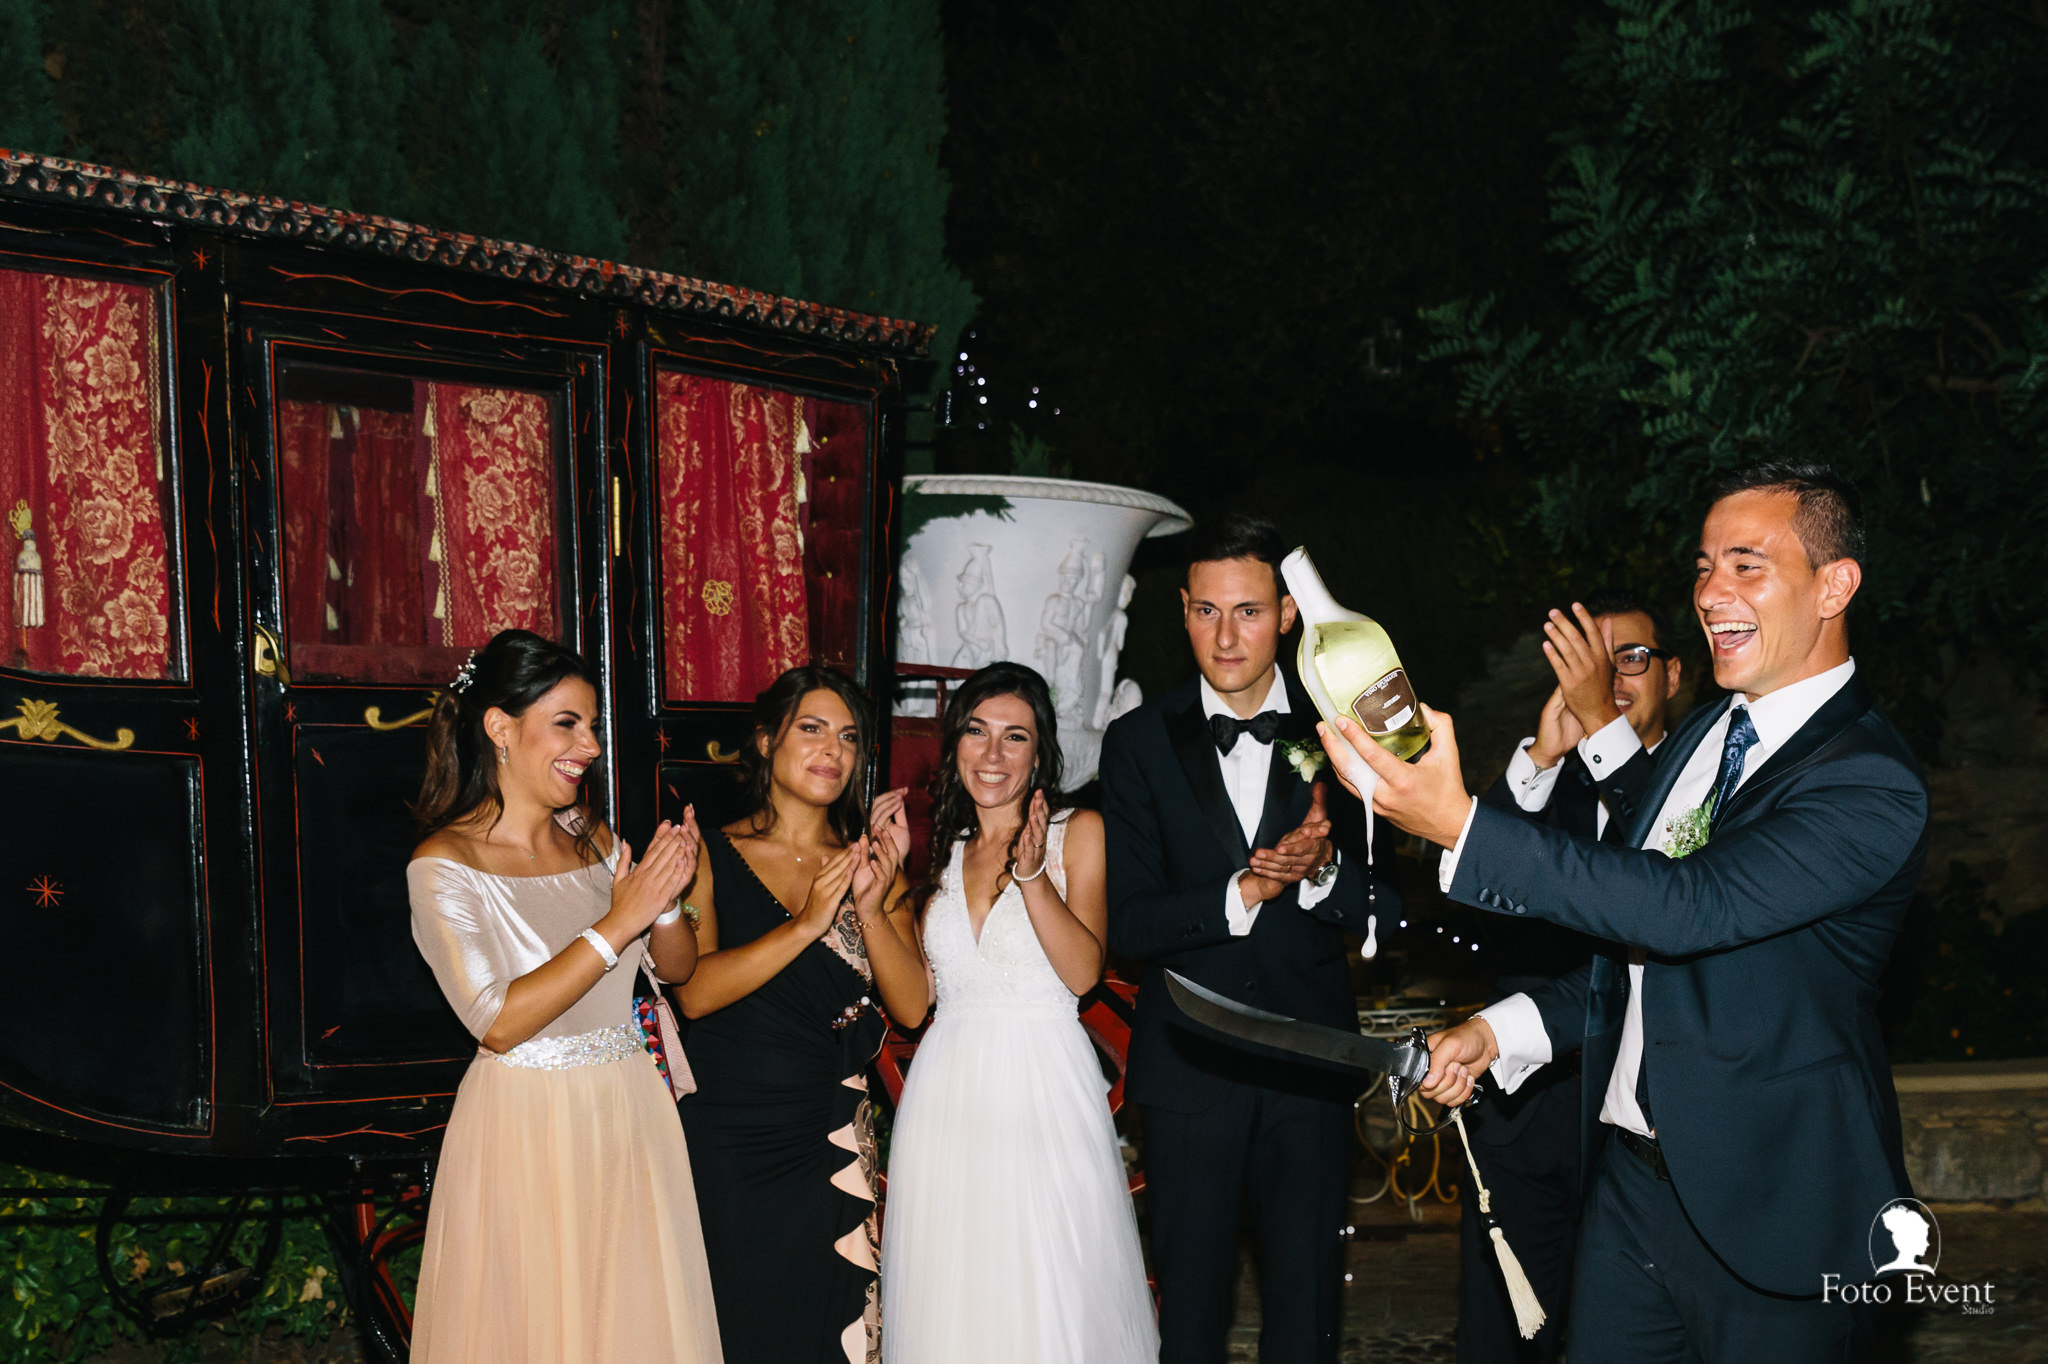 041-2019-08-23-Matrimonio-Lucia-e-Rosario-Scopelliti-5DE-2093